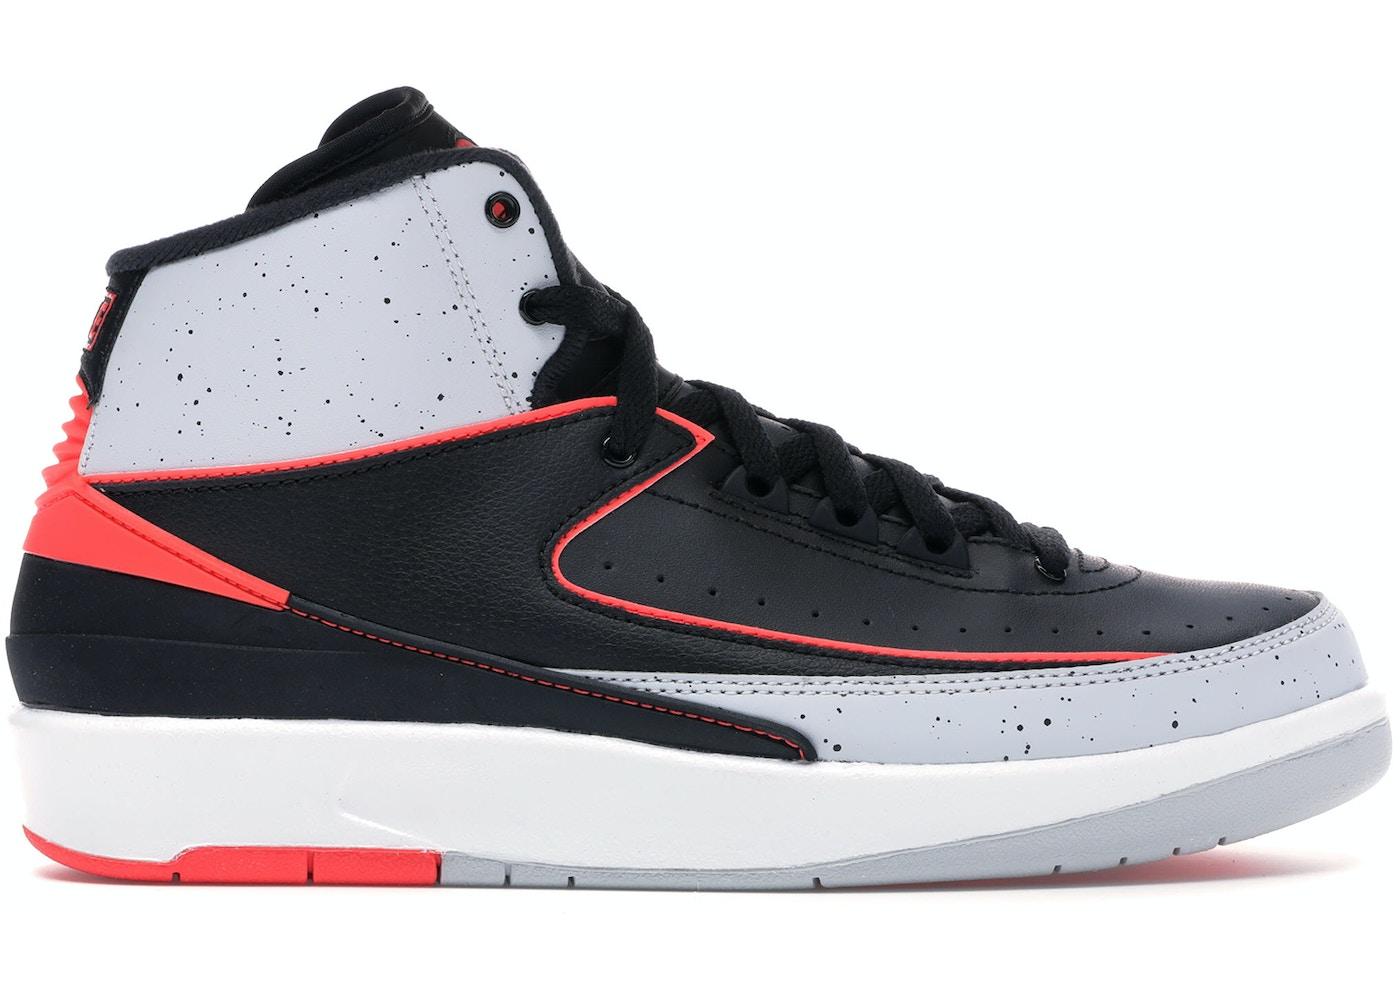 hot sale online b1b3c e00bb Jordan 2 Retro Infrared 23 (GS)